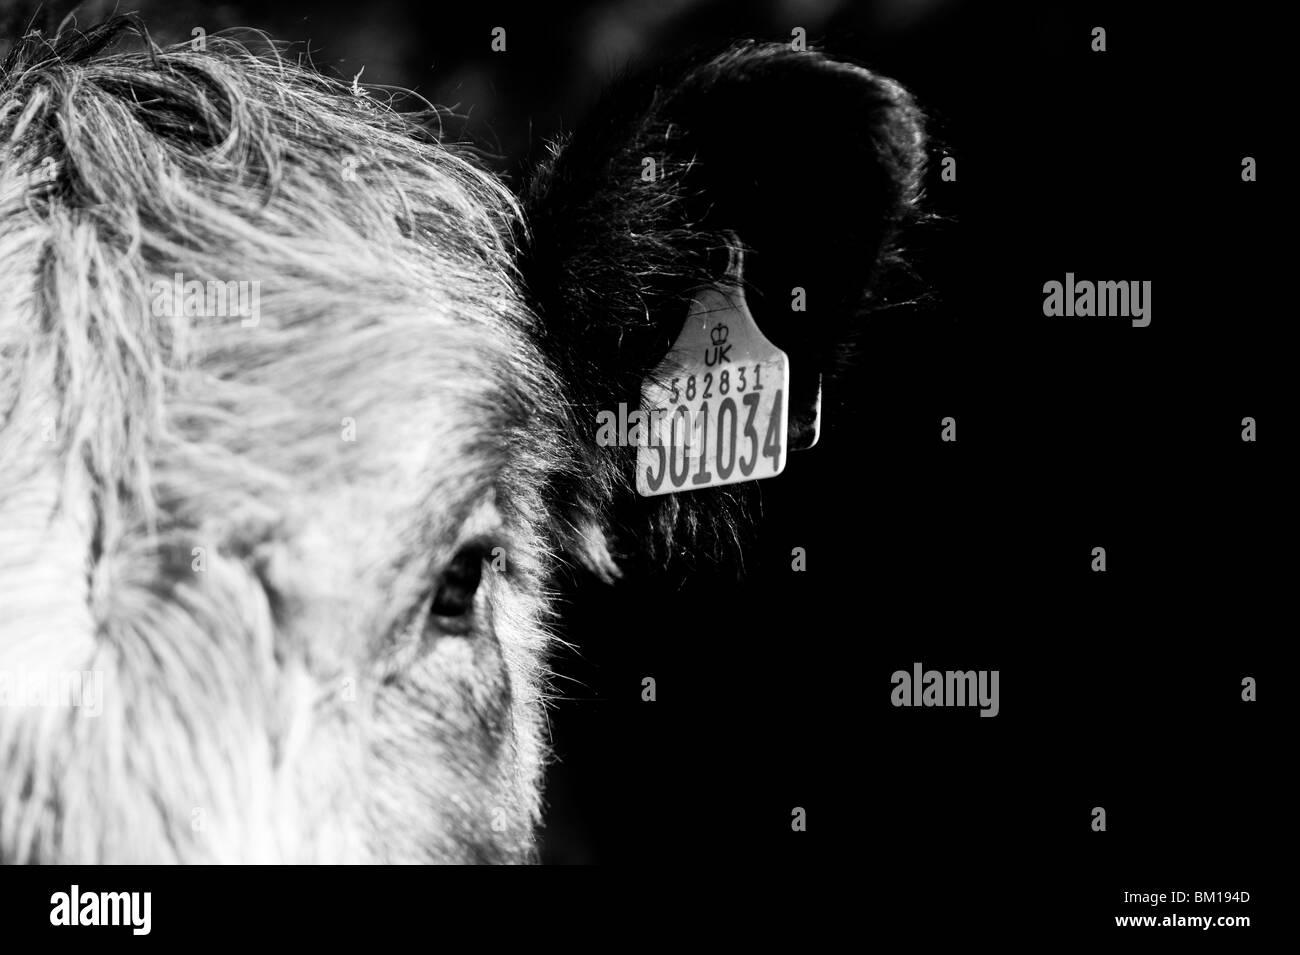 Vaca Galloway Robert campiña agrícola Bull ternero Imagen De Stock